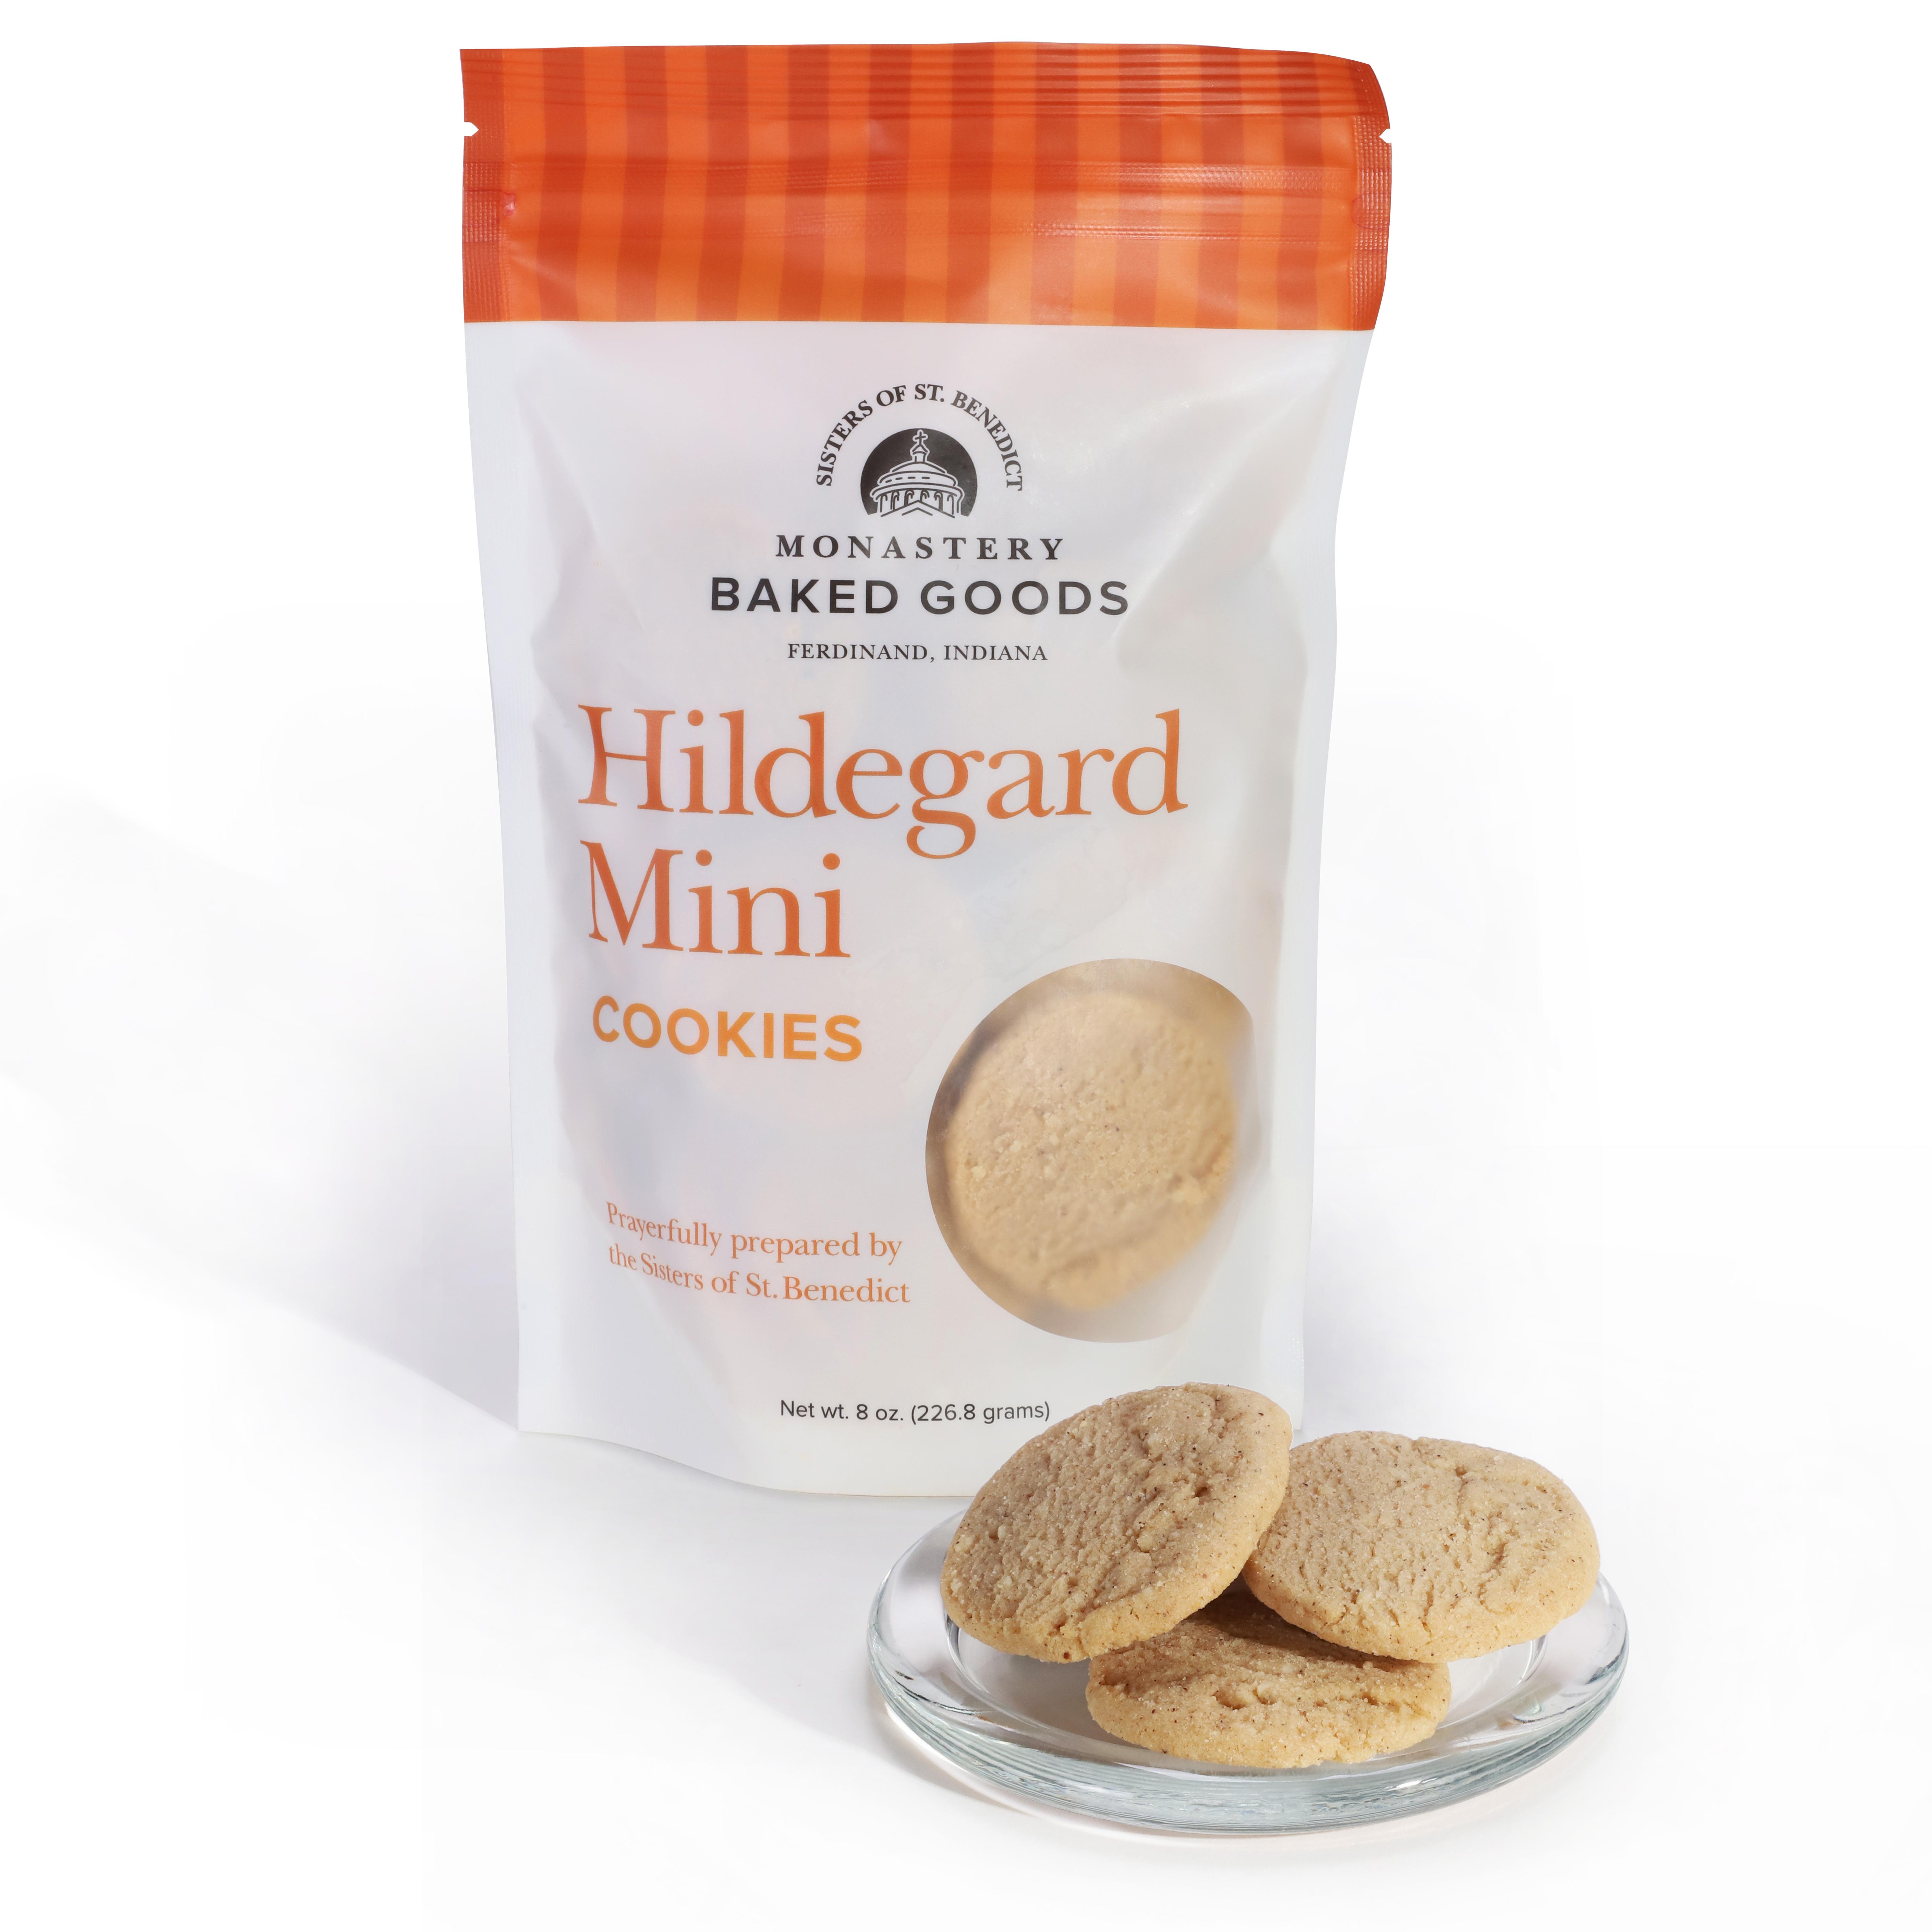 Hildegard Mini Cookies (8-oz. bag)